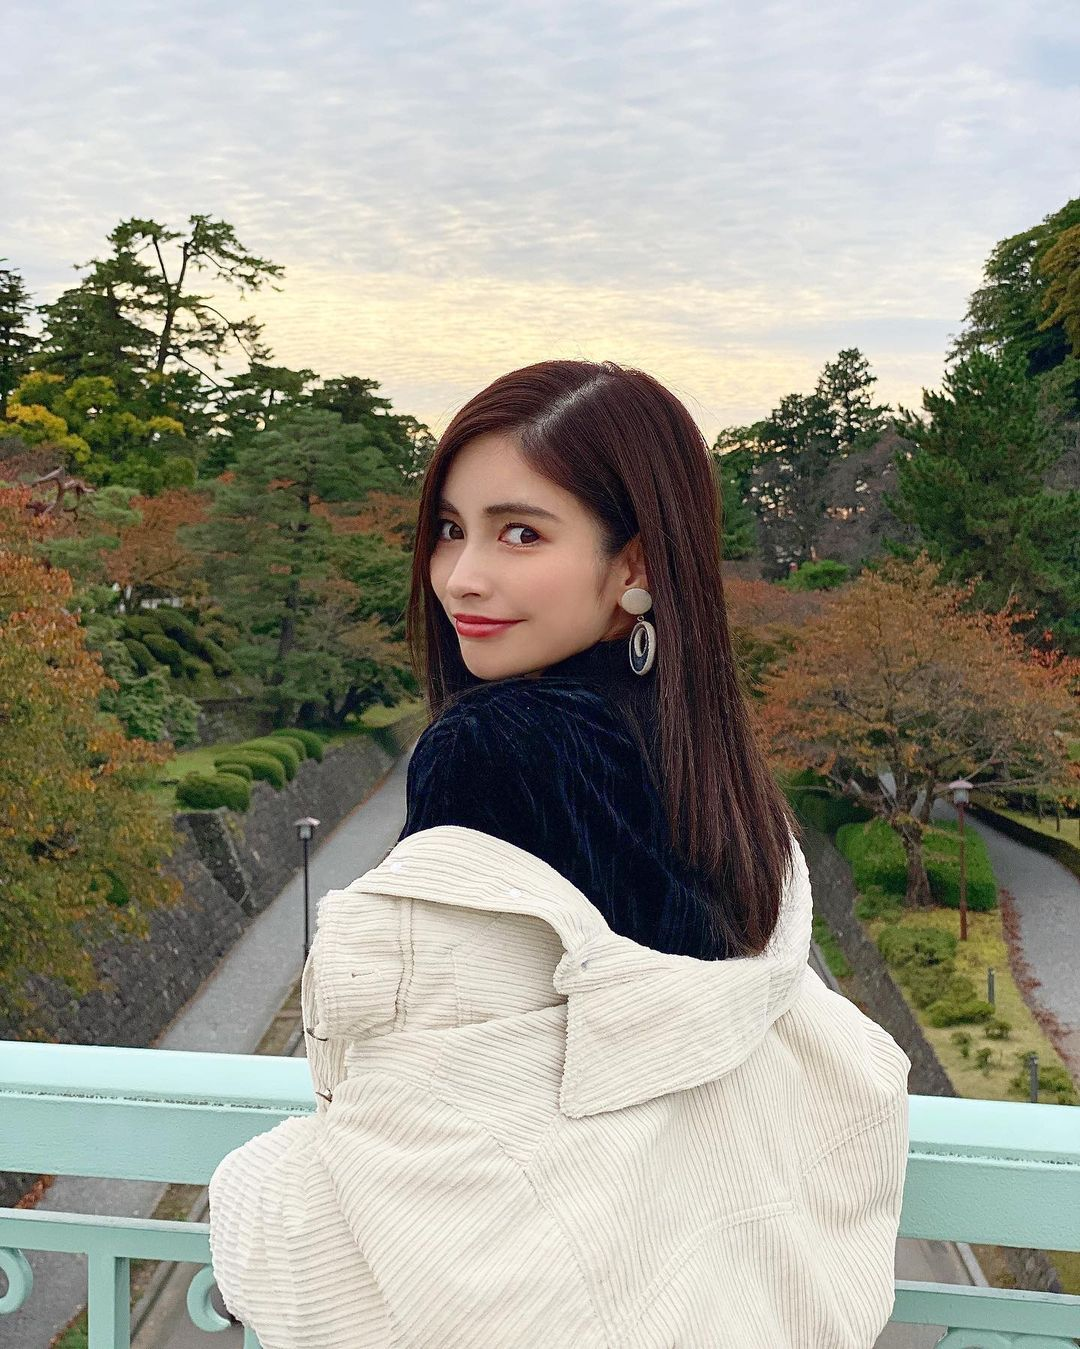 长发御姐@得丸あゆみ 甜美笑容让人秒沦陷 网络美女 第4张